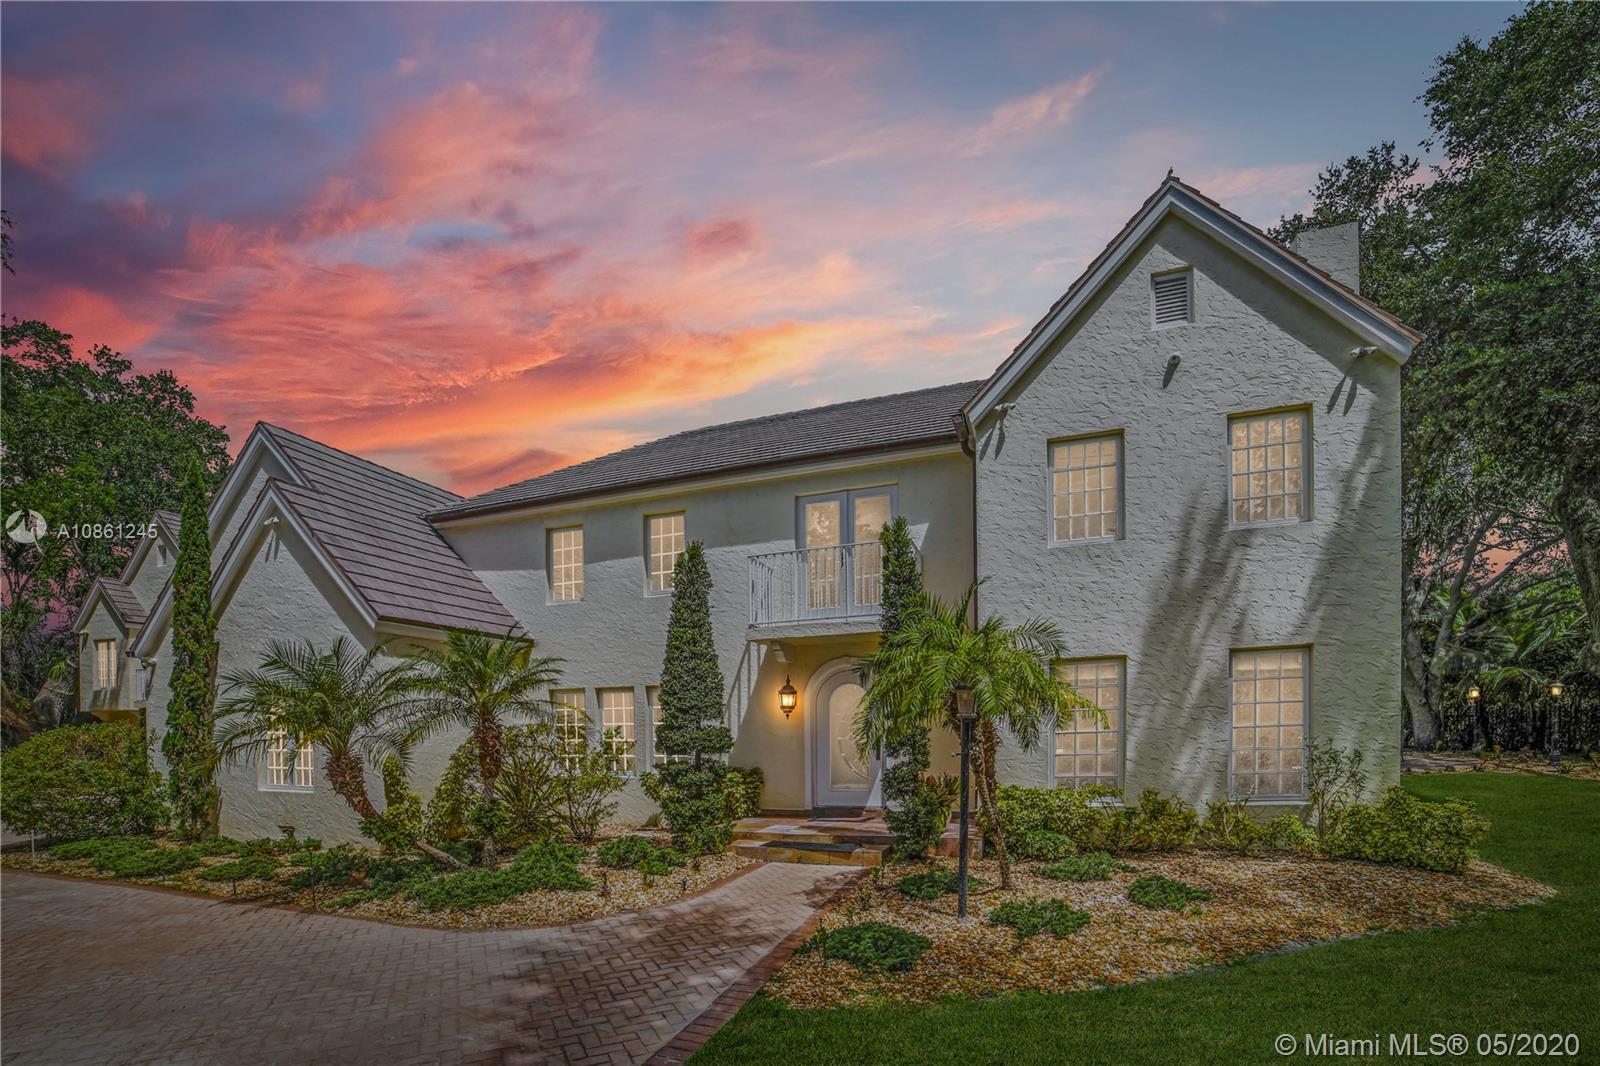 6750 Granada Blvd, Coral Gables, Florida